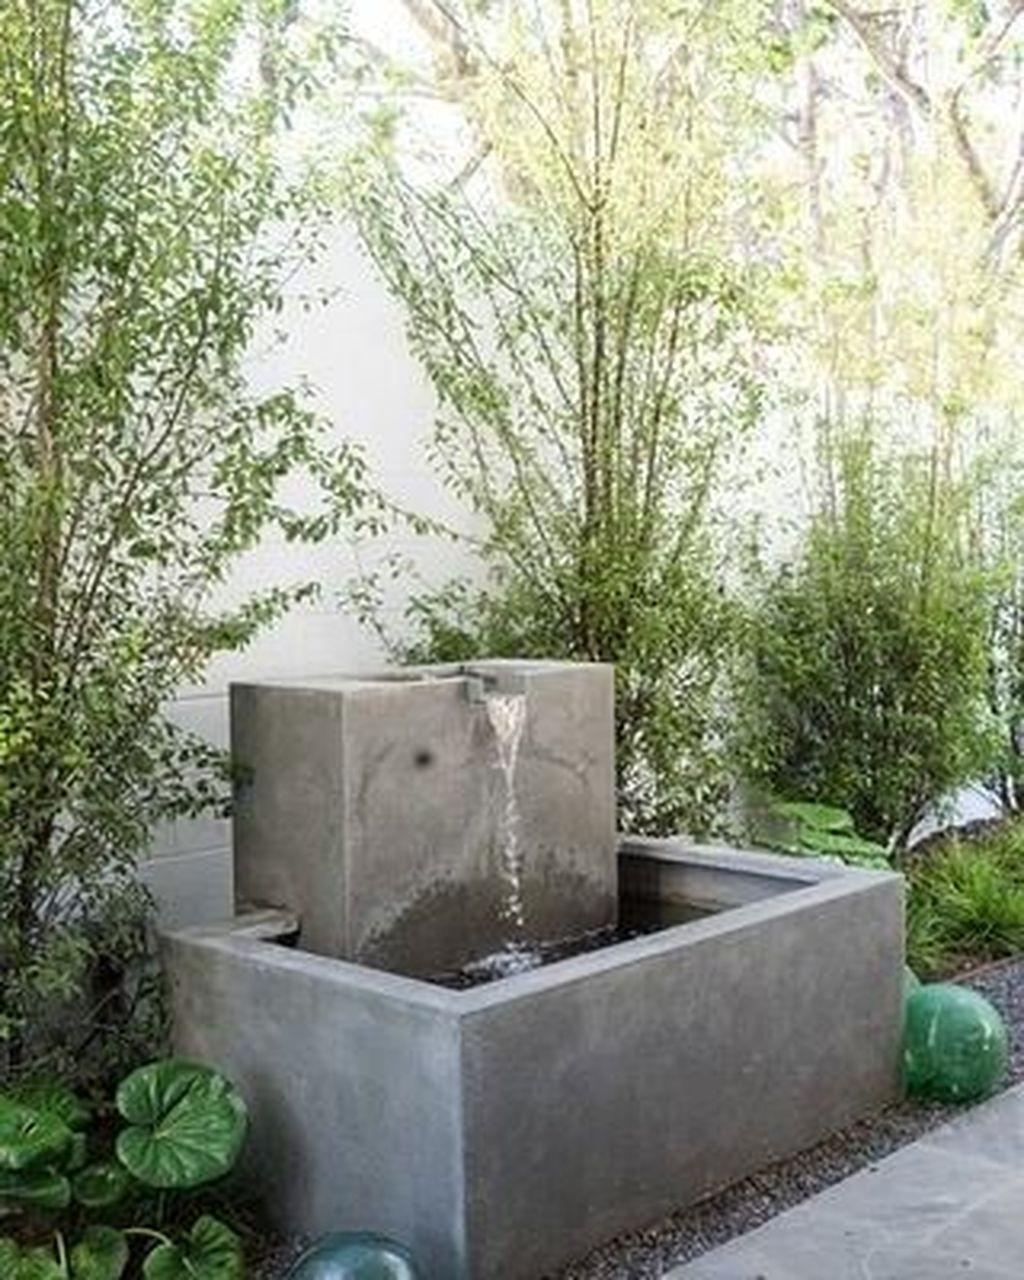 30 Stylish Outdoor Water Walls Ideas For Backyard Fountains Backyard Garden Fountains Outdoor Concrete Fountains Modern backyard water fountain